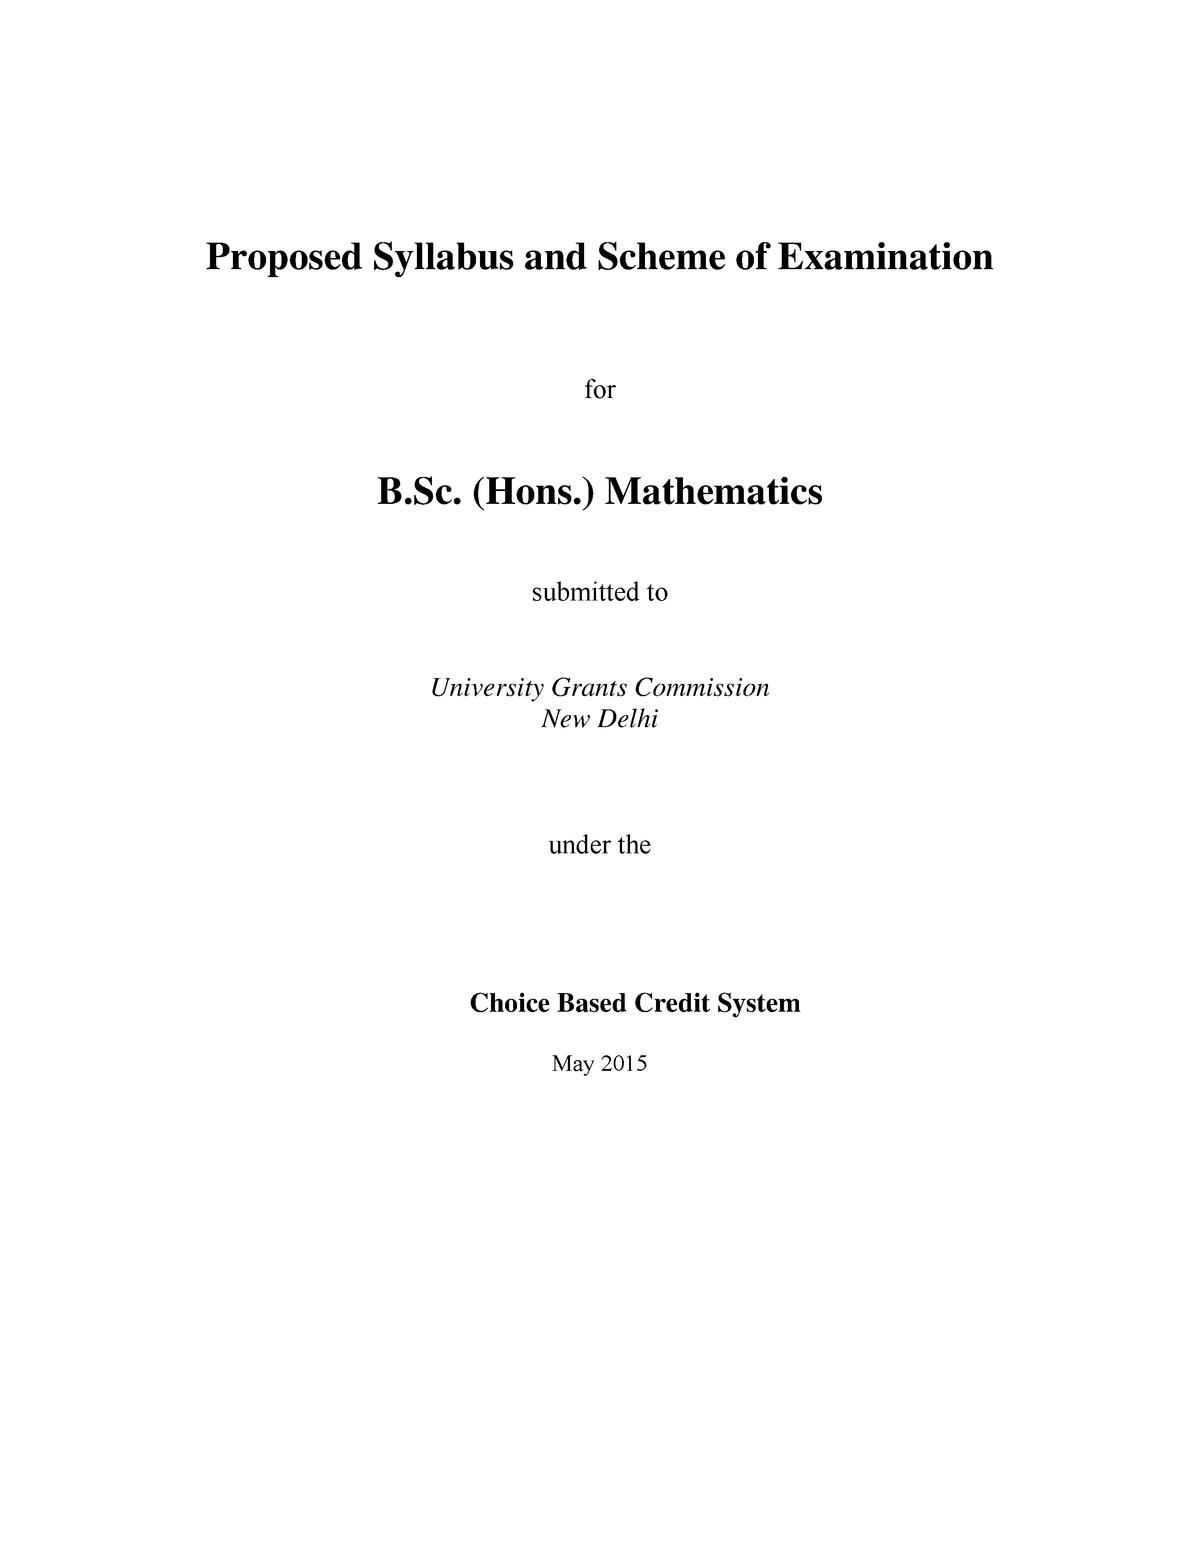 Maths syllabus by ugc - Ncert solutions - StuDocu